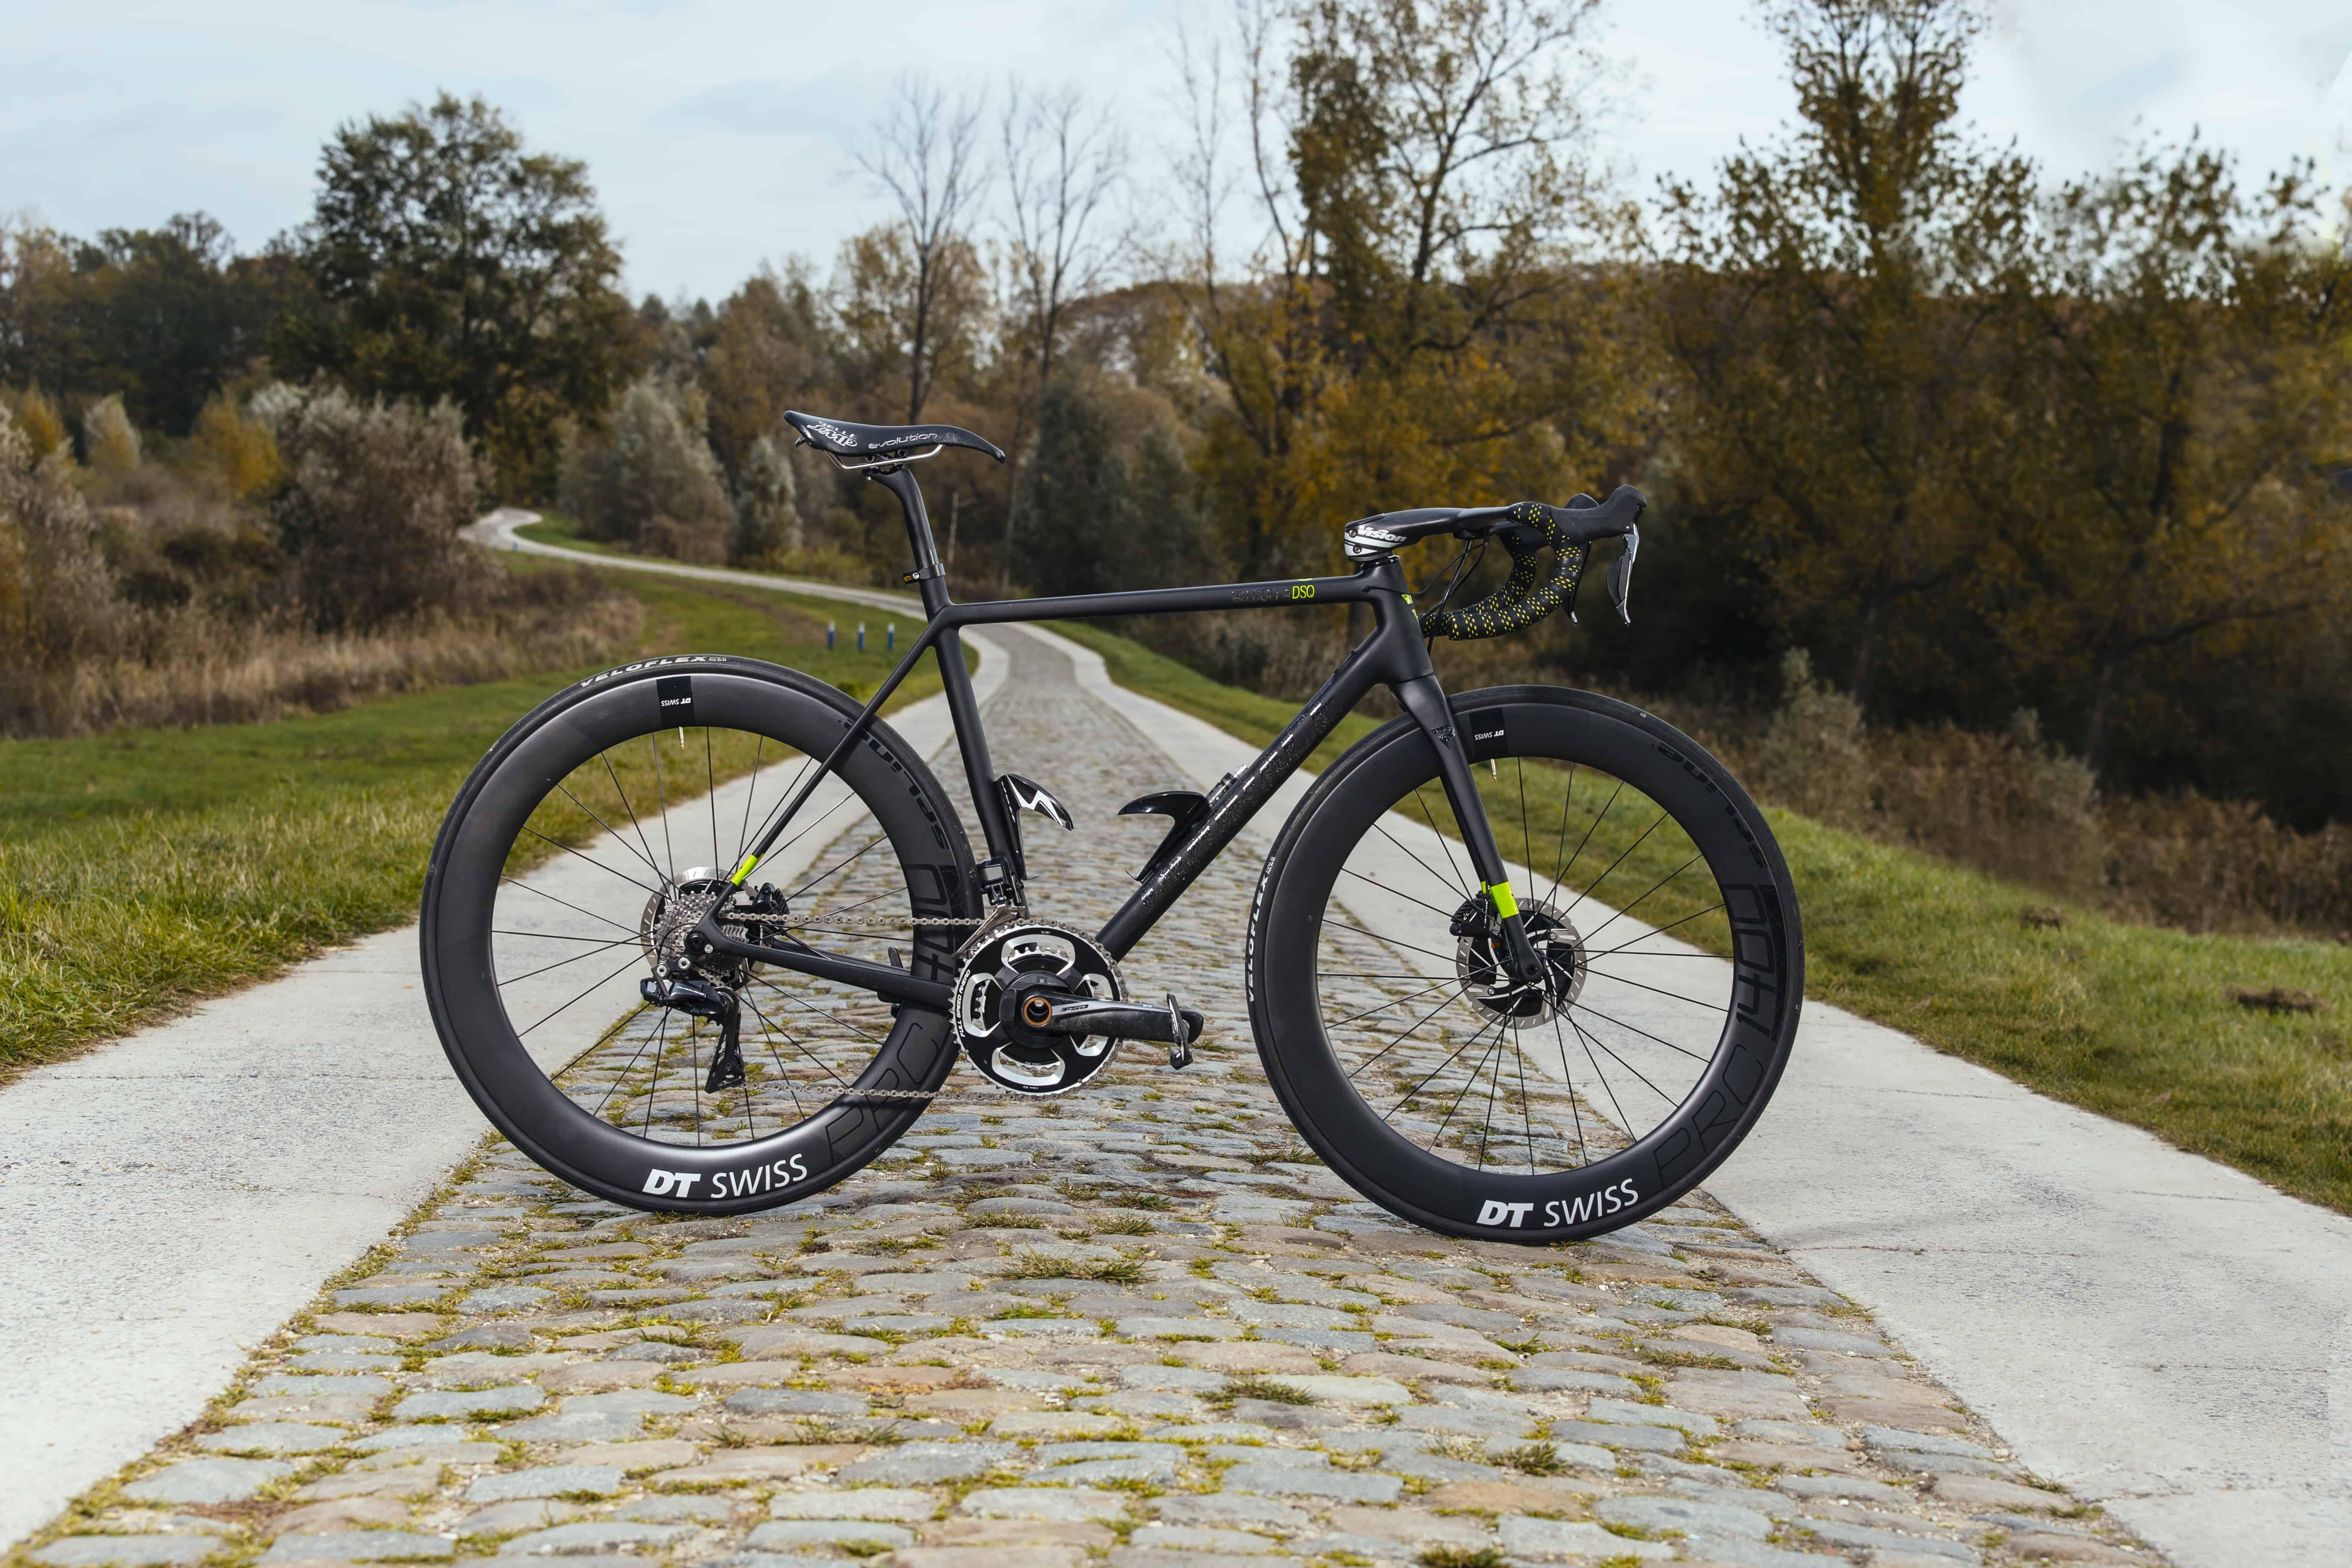 Valcolla DSQ lightweight fiets Prorace met schijfremmen